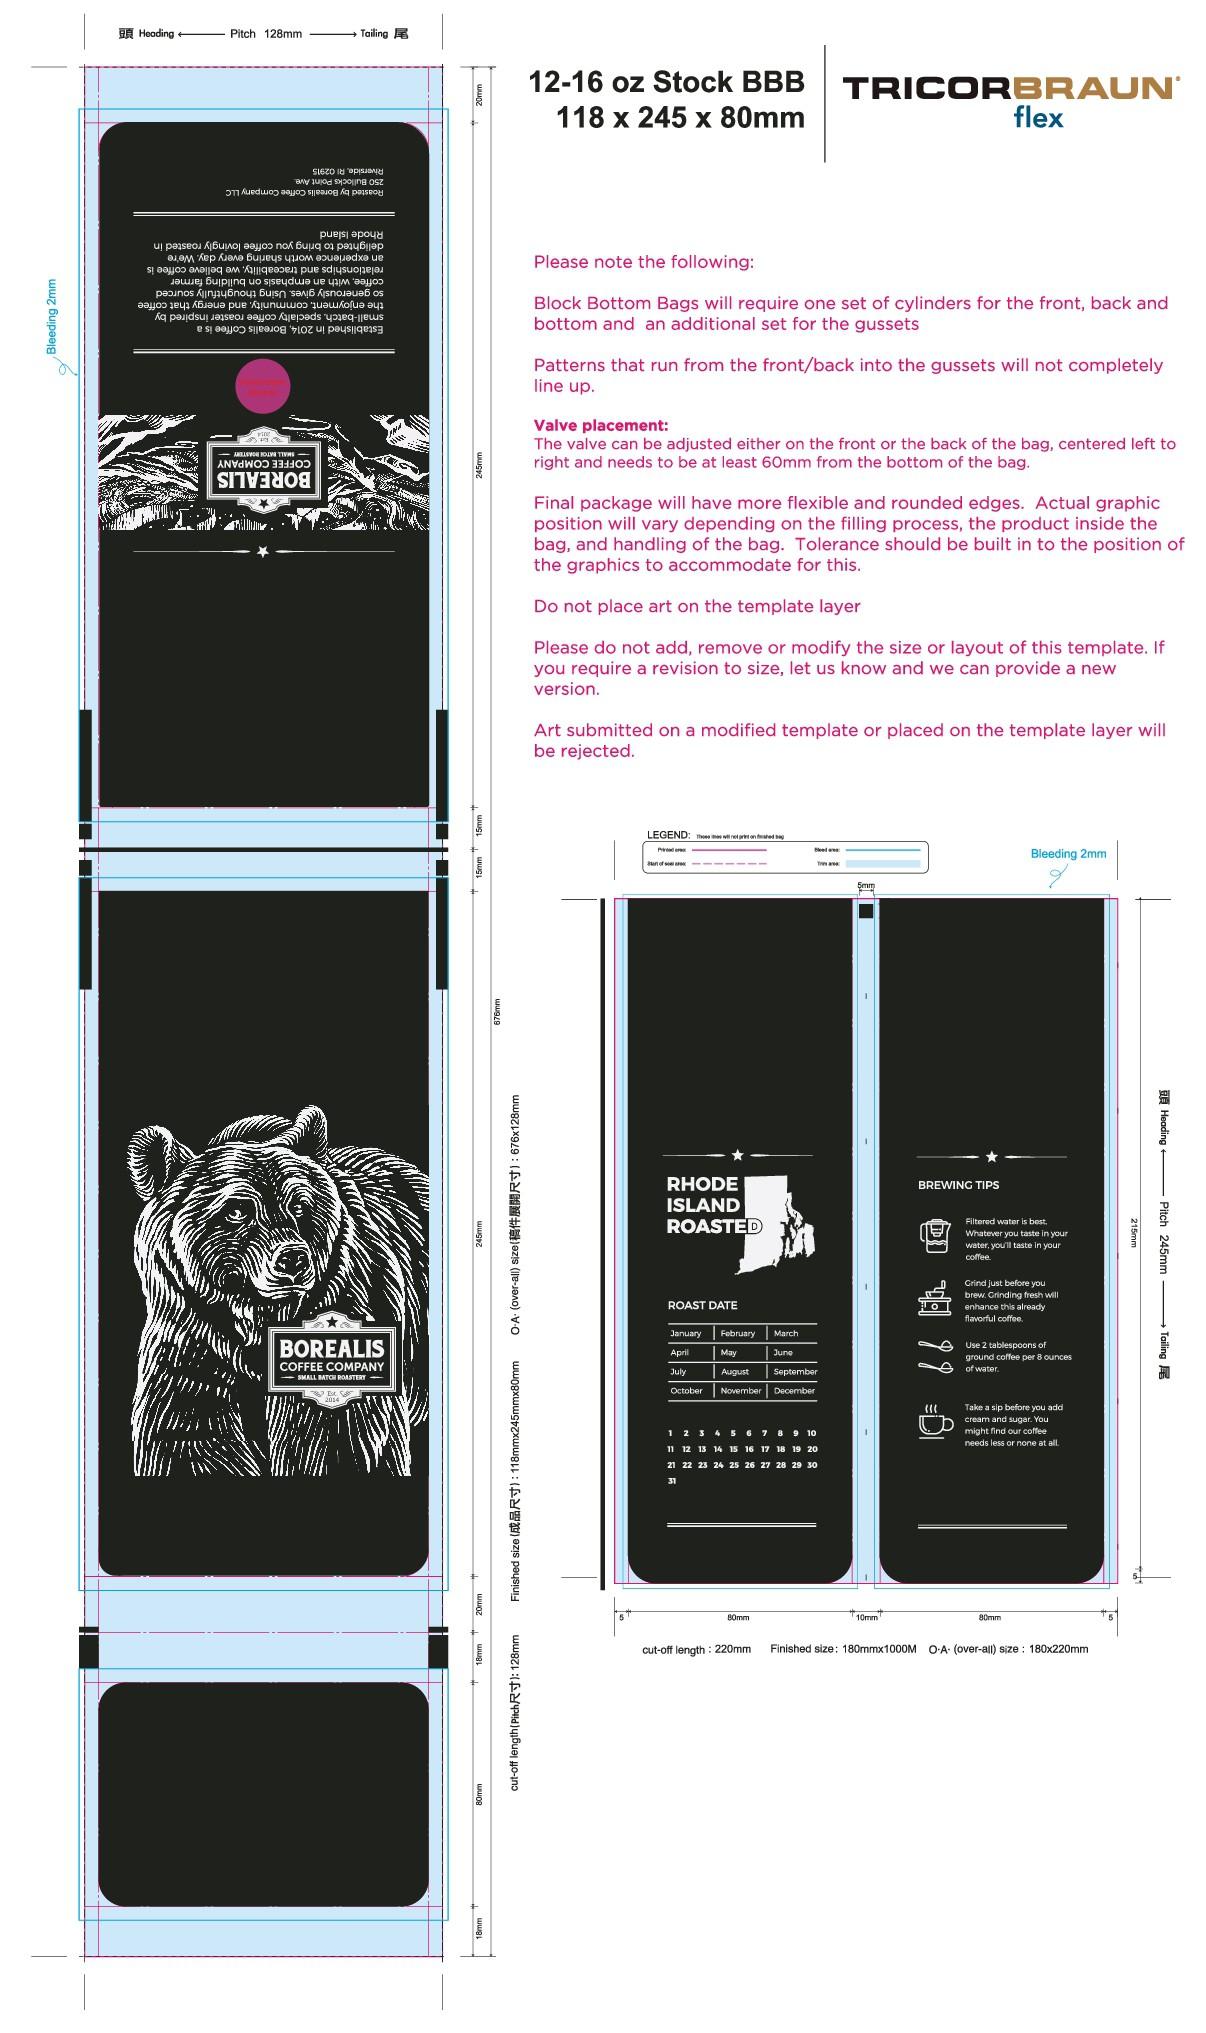 Borealis Coffee Packaging Redesign